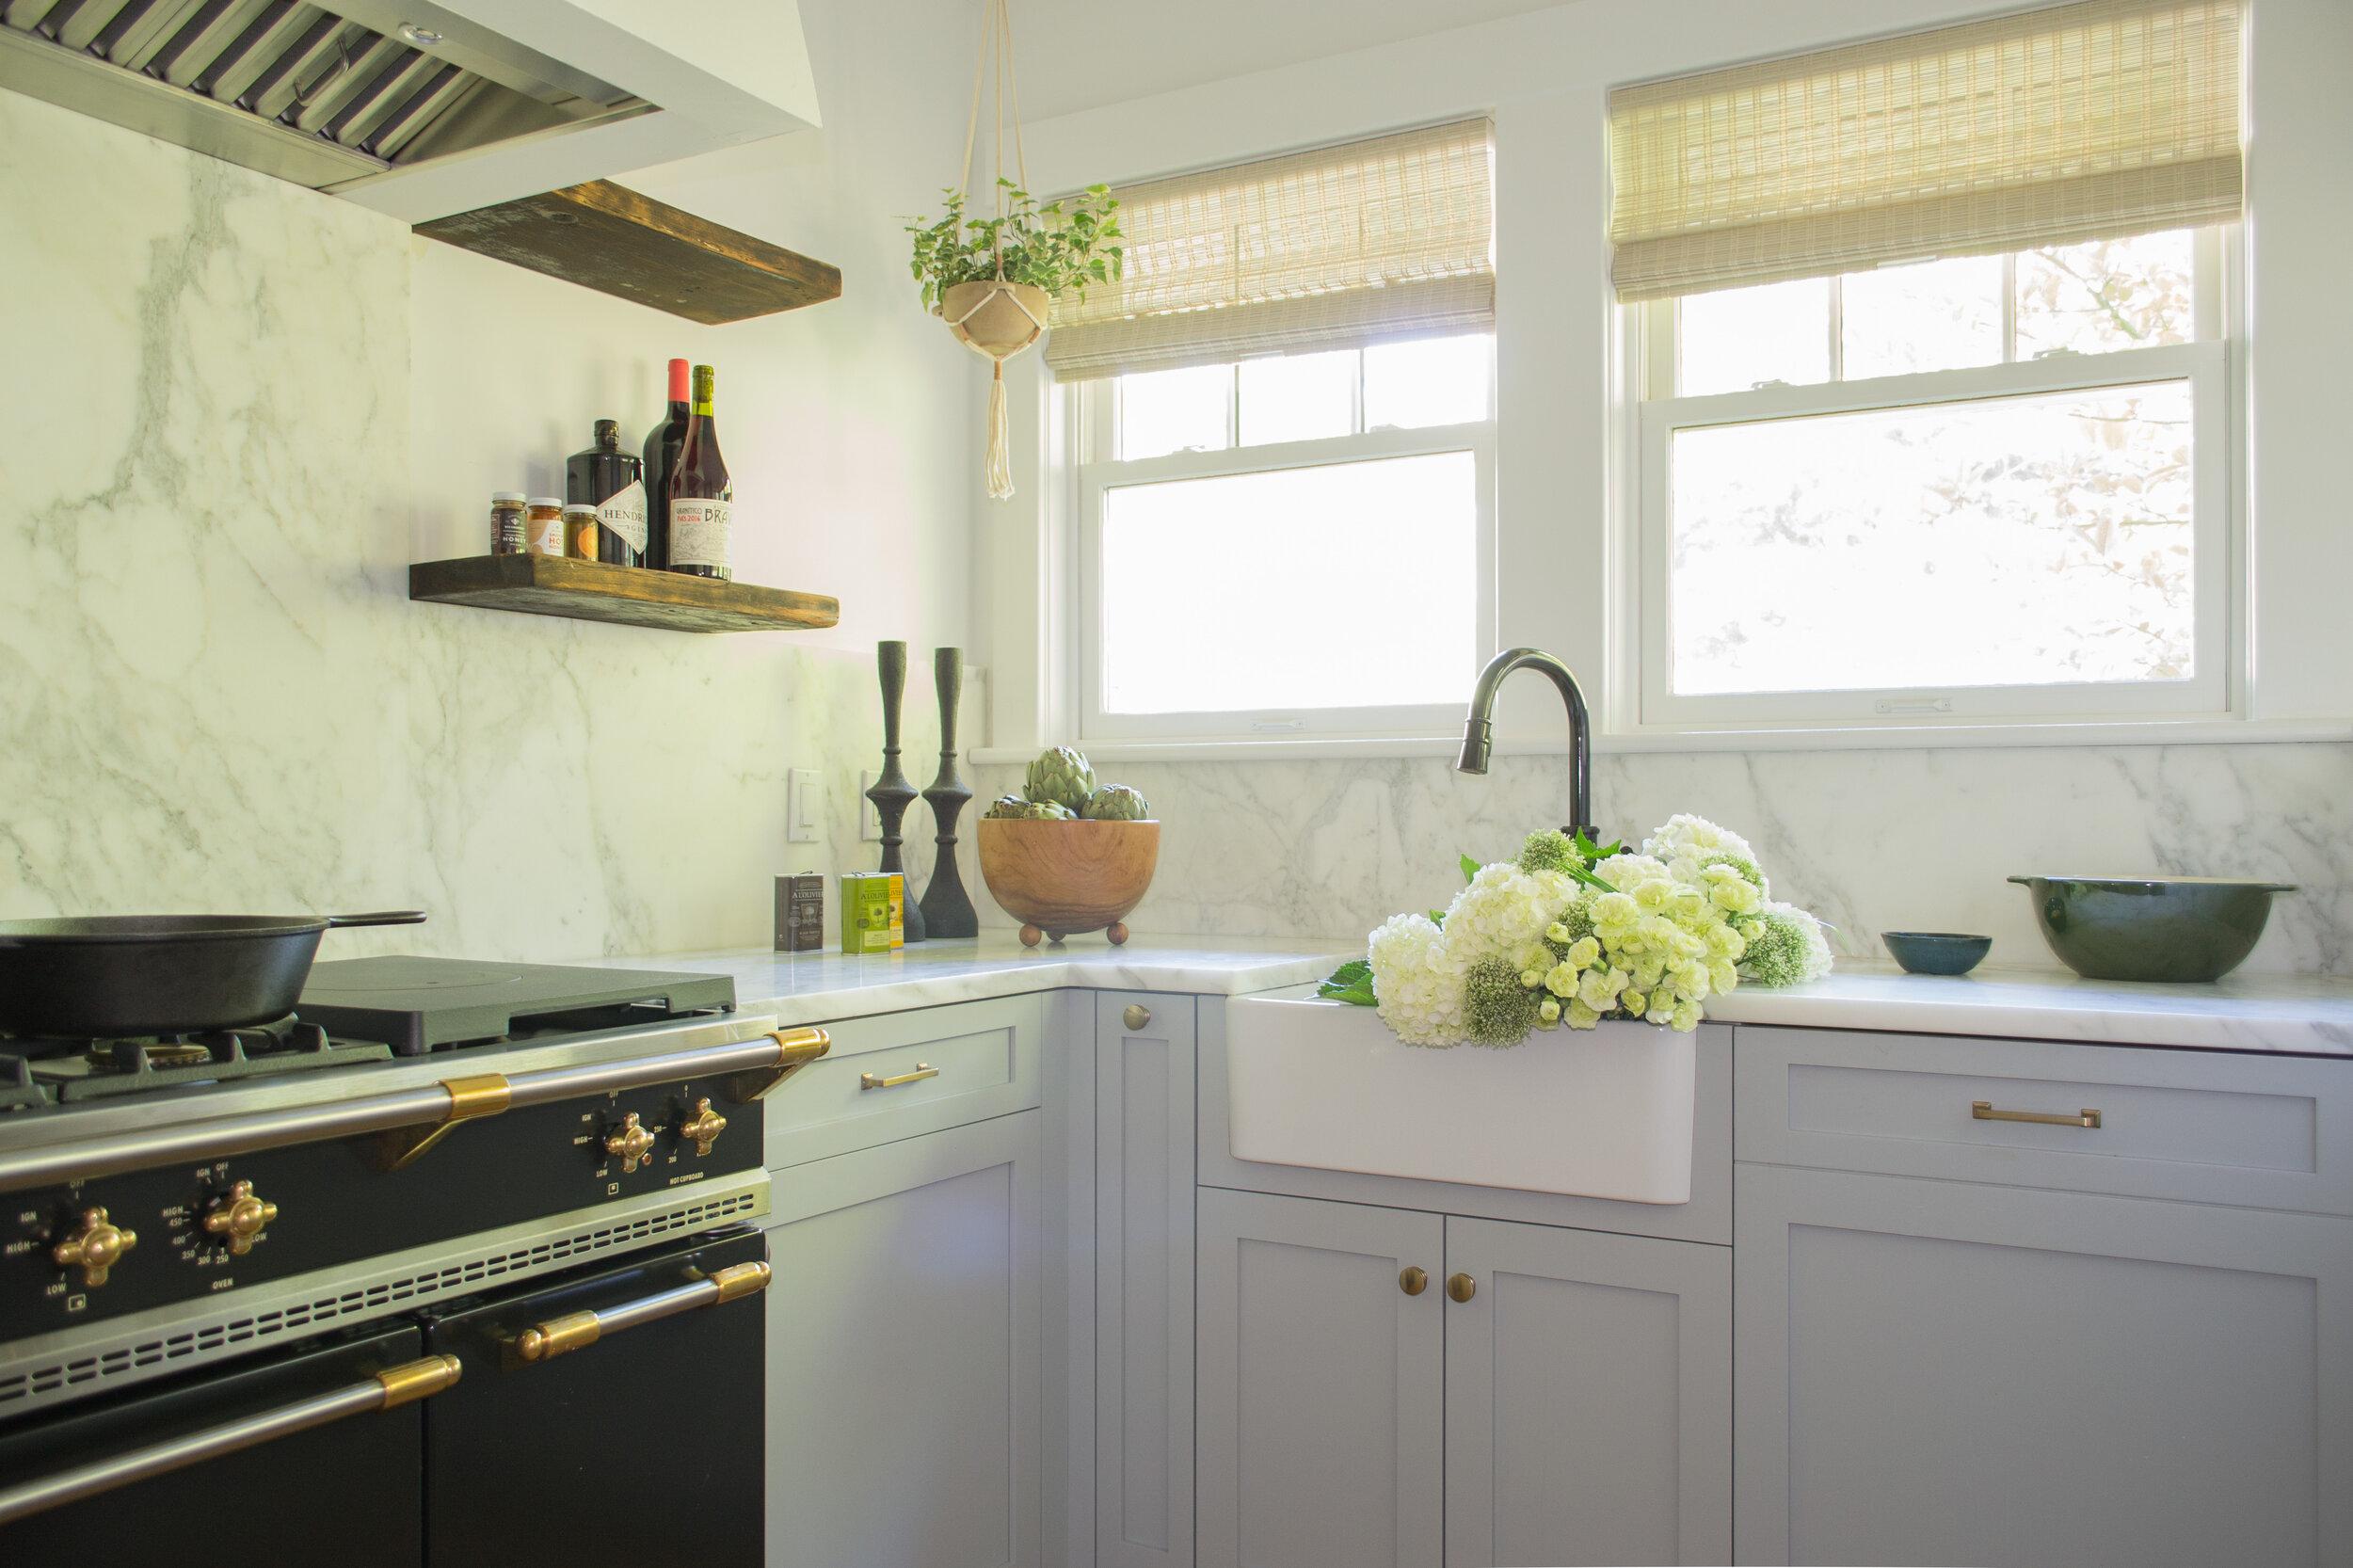 kitchen-gray-modern-tc-interiors-7.jpg